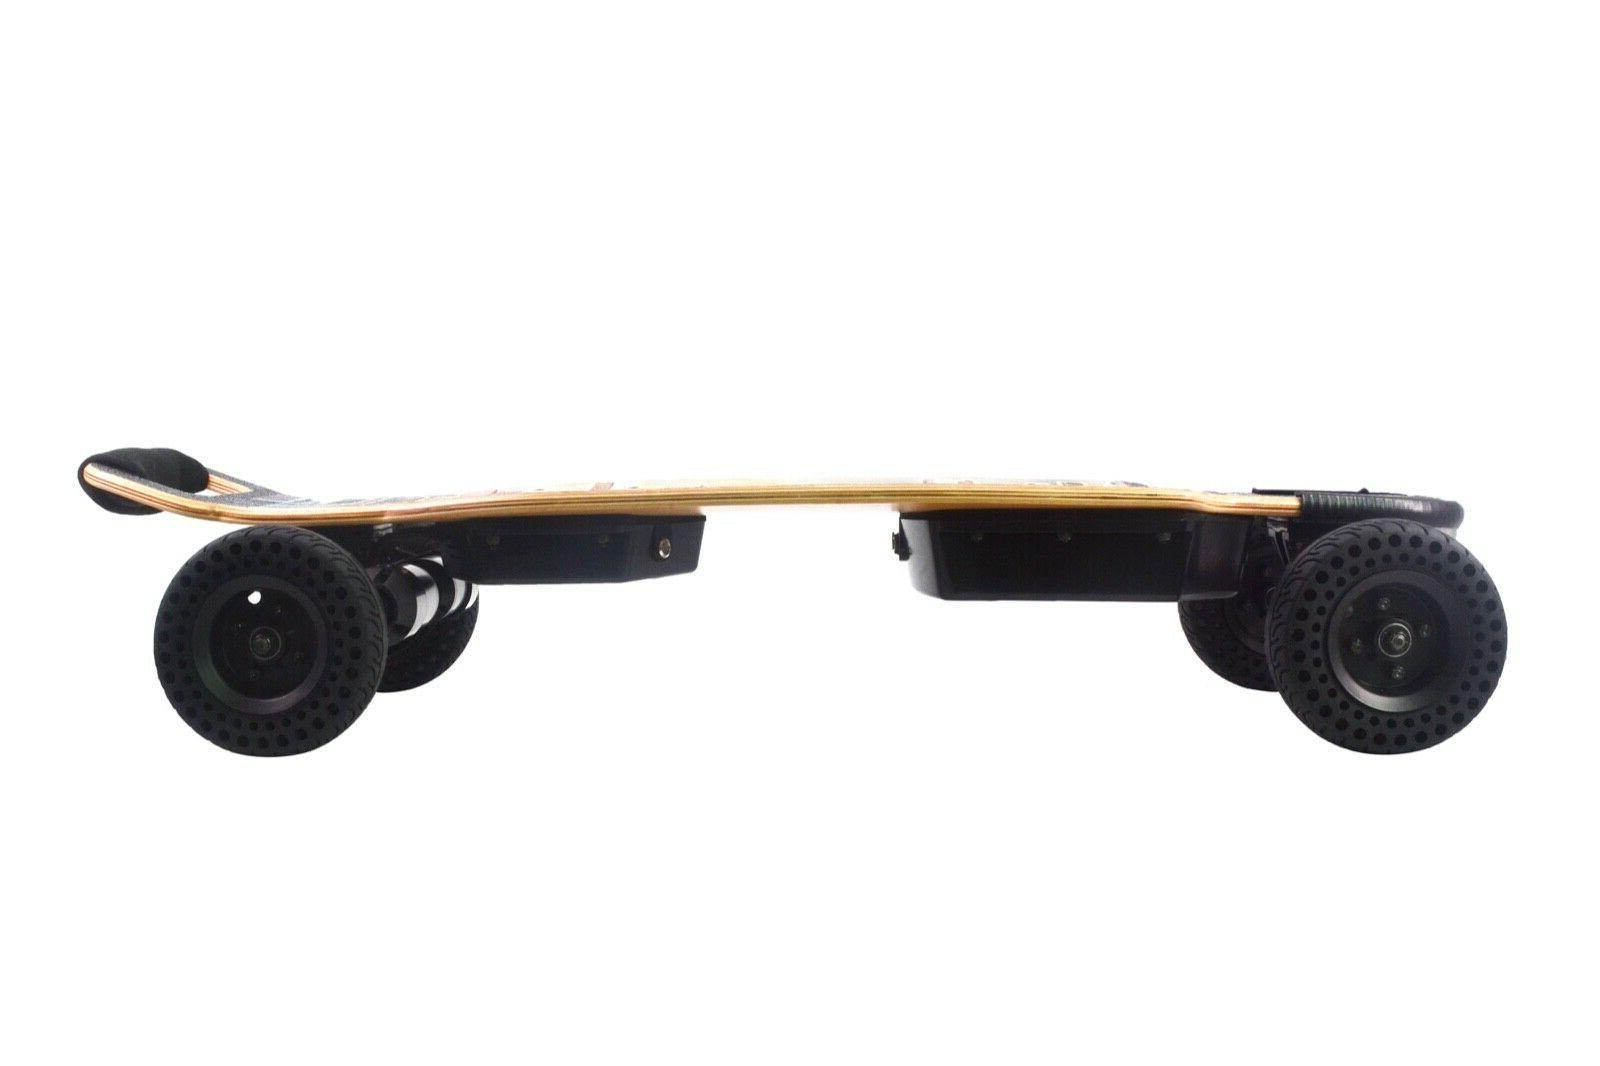 FALL $500 CityBomb Skateboard Off Road